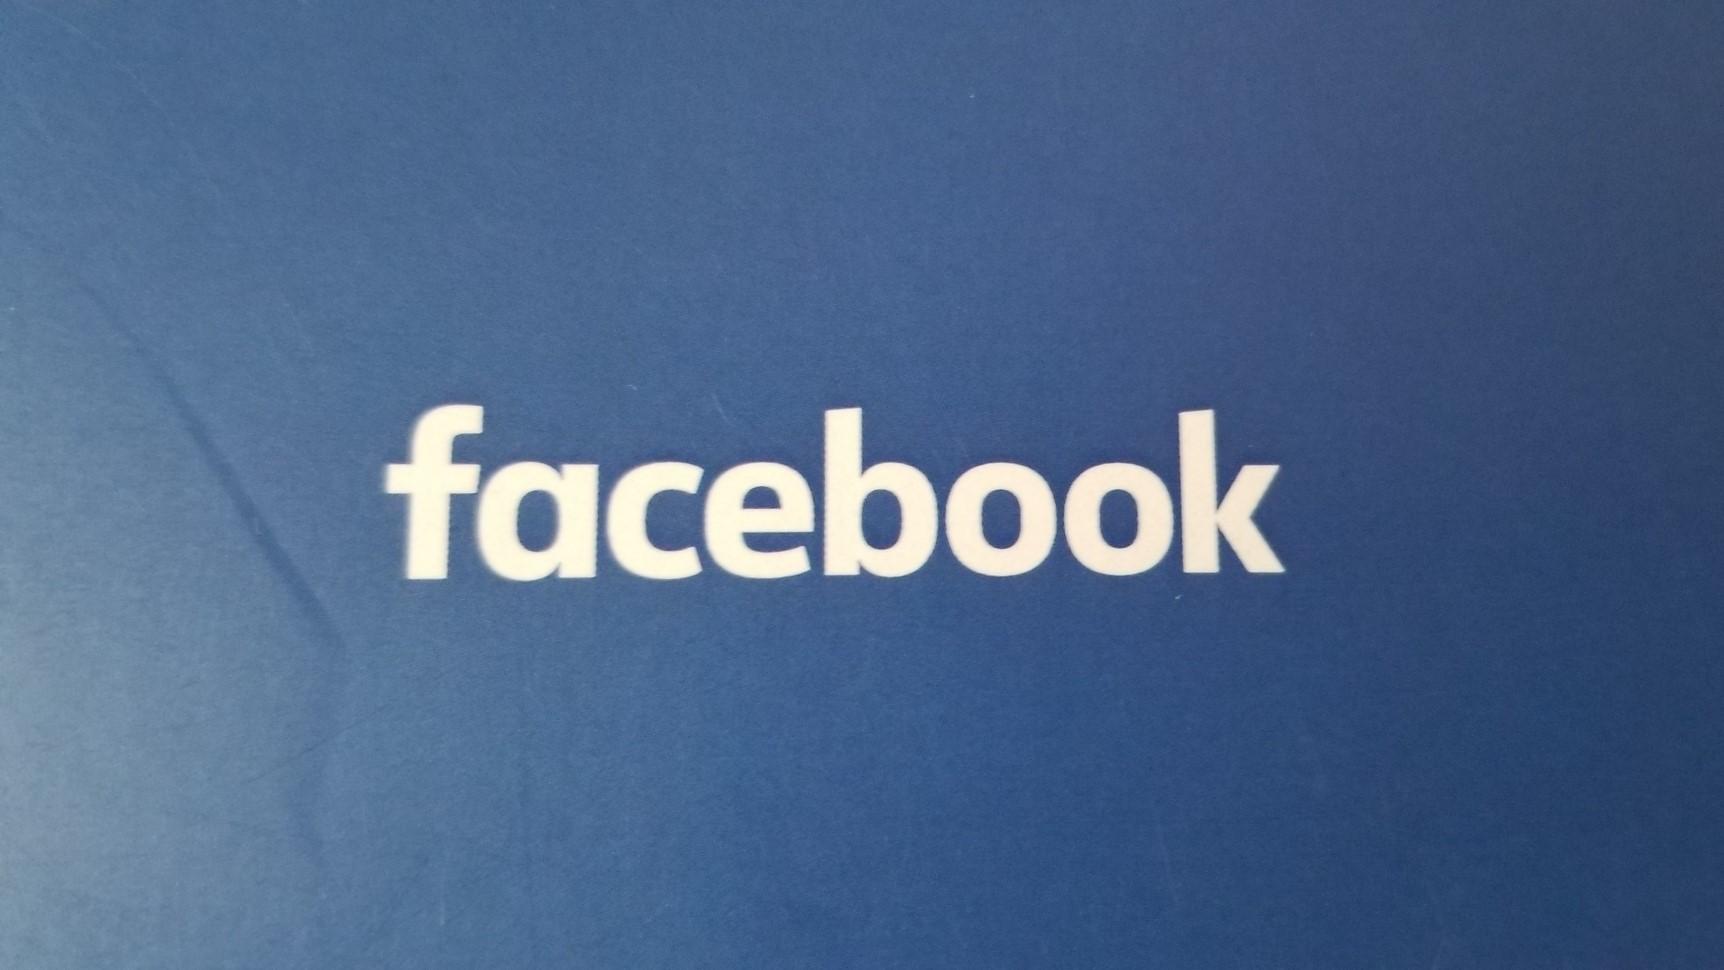 Live Stream Christchurch News: Facebook 'Morally Bankrupt Pathological Liars', Says NZ